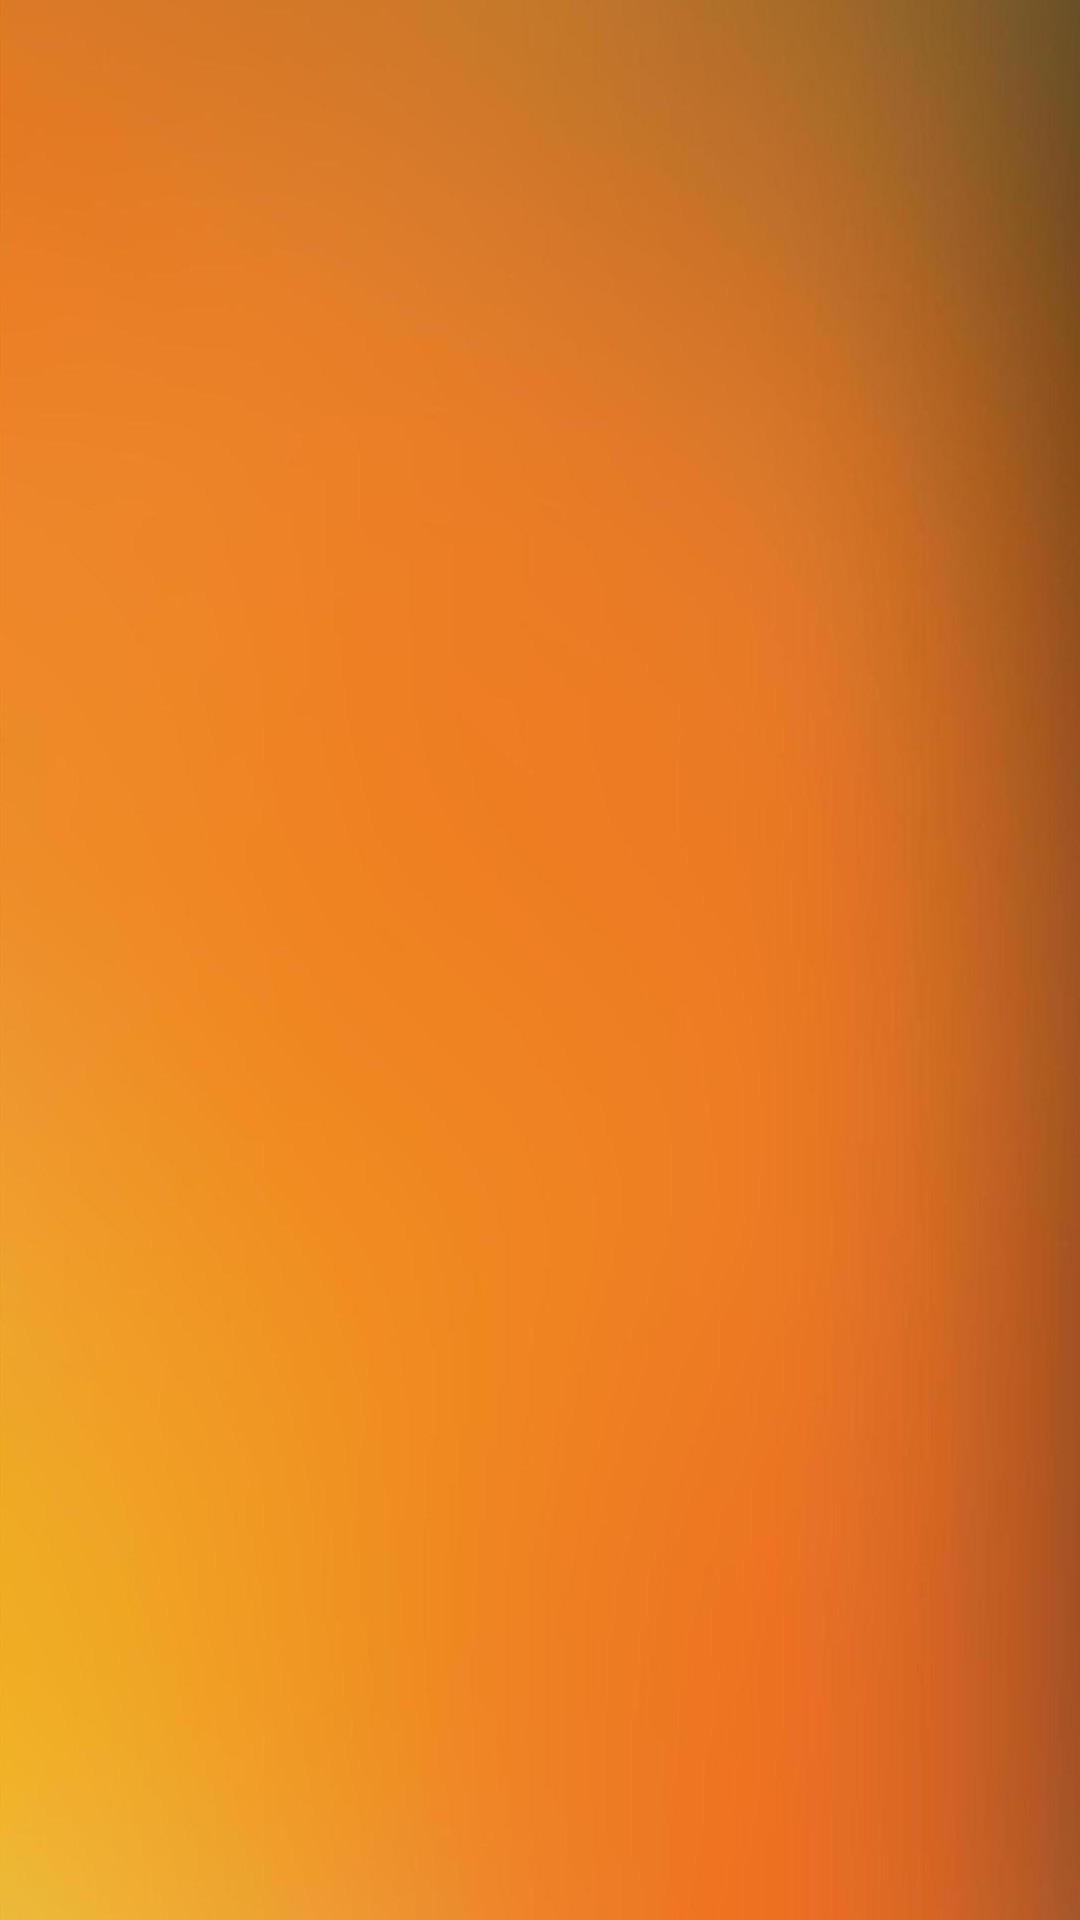 Nexus 5 wallpaper size